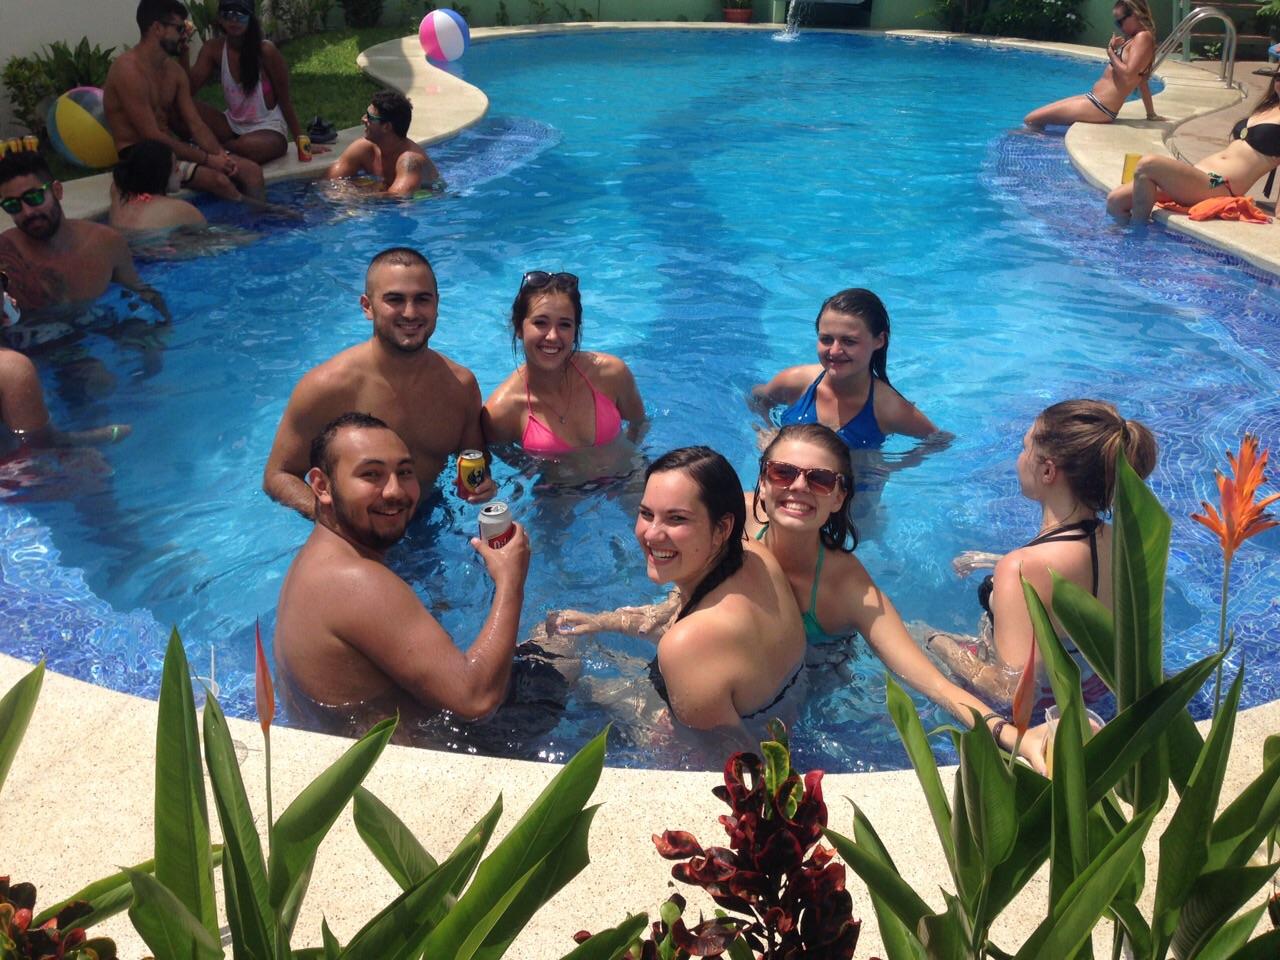 Pool Party at Room2Board Hostel & Surf School